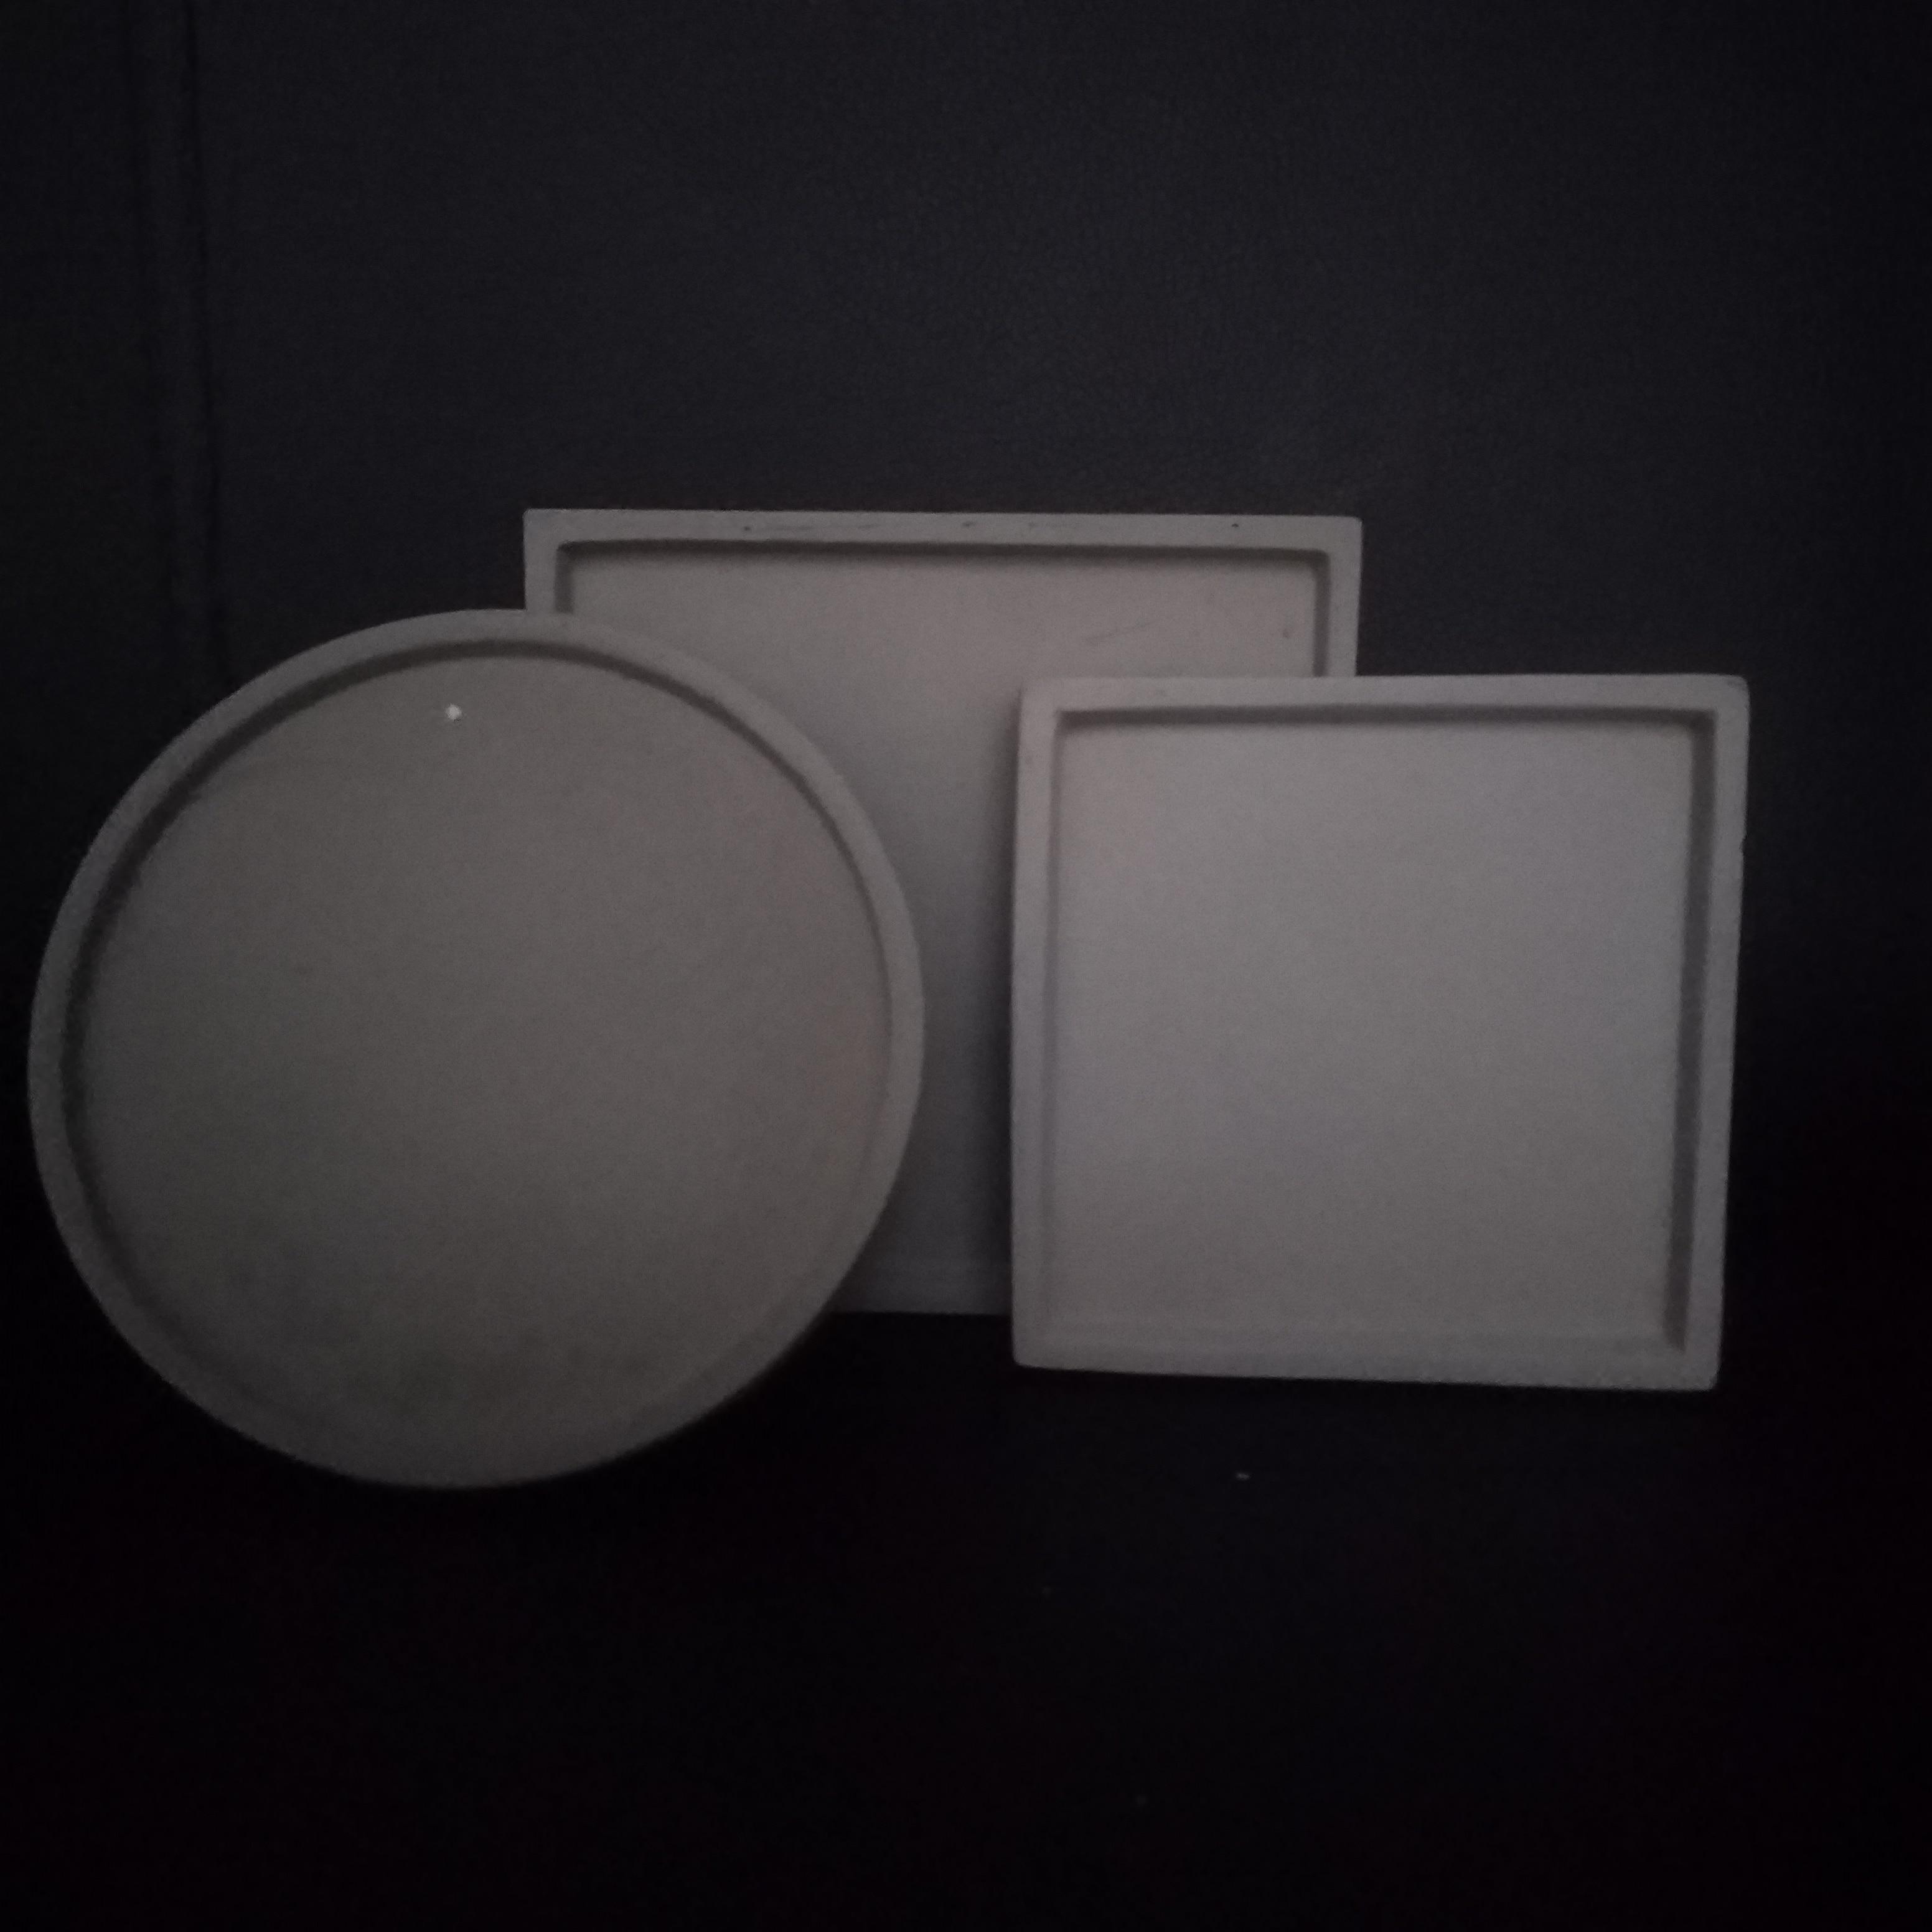 Runde Platz blume topf halter beton blumentopf fach formen silikon material für zement gips ton topf halten form